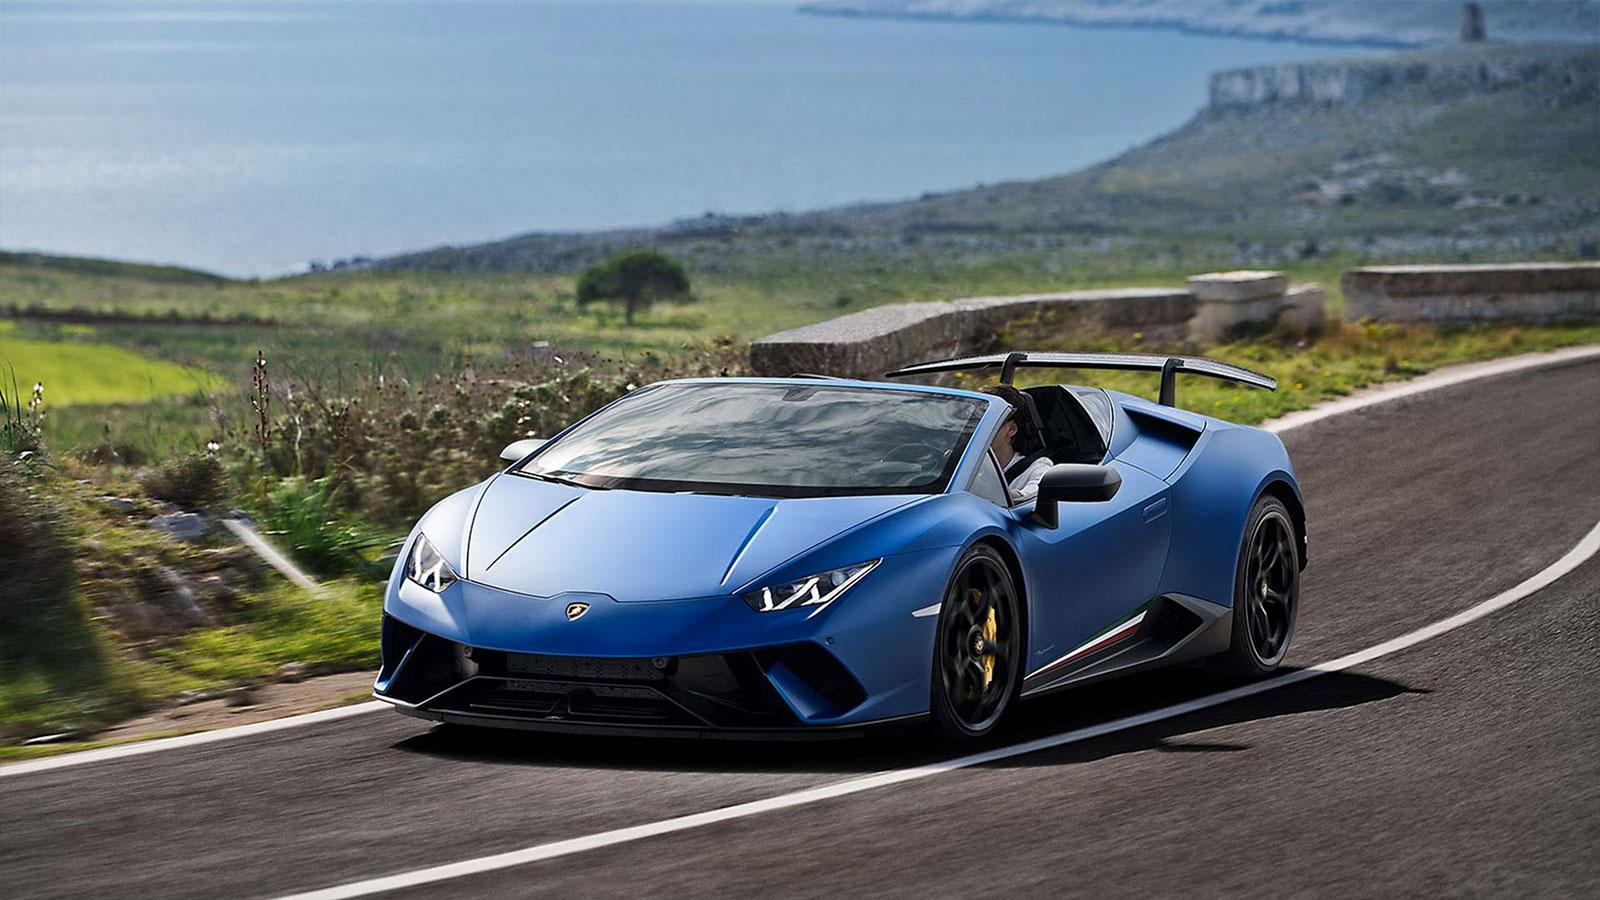 Lamborghini Huracan Performante Spyder - Vivid Technology image 6